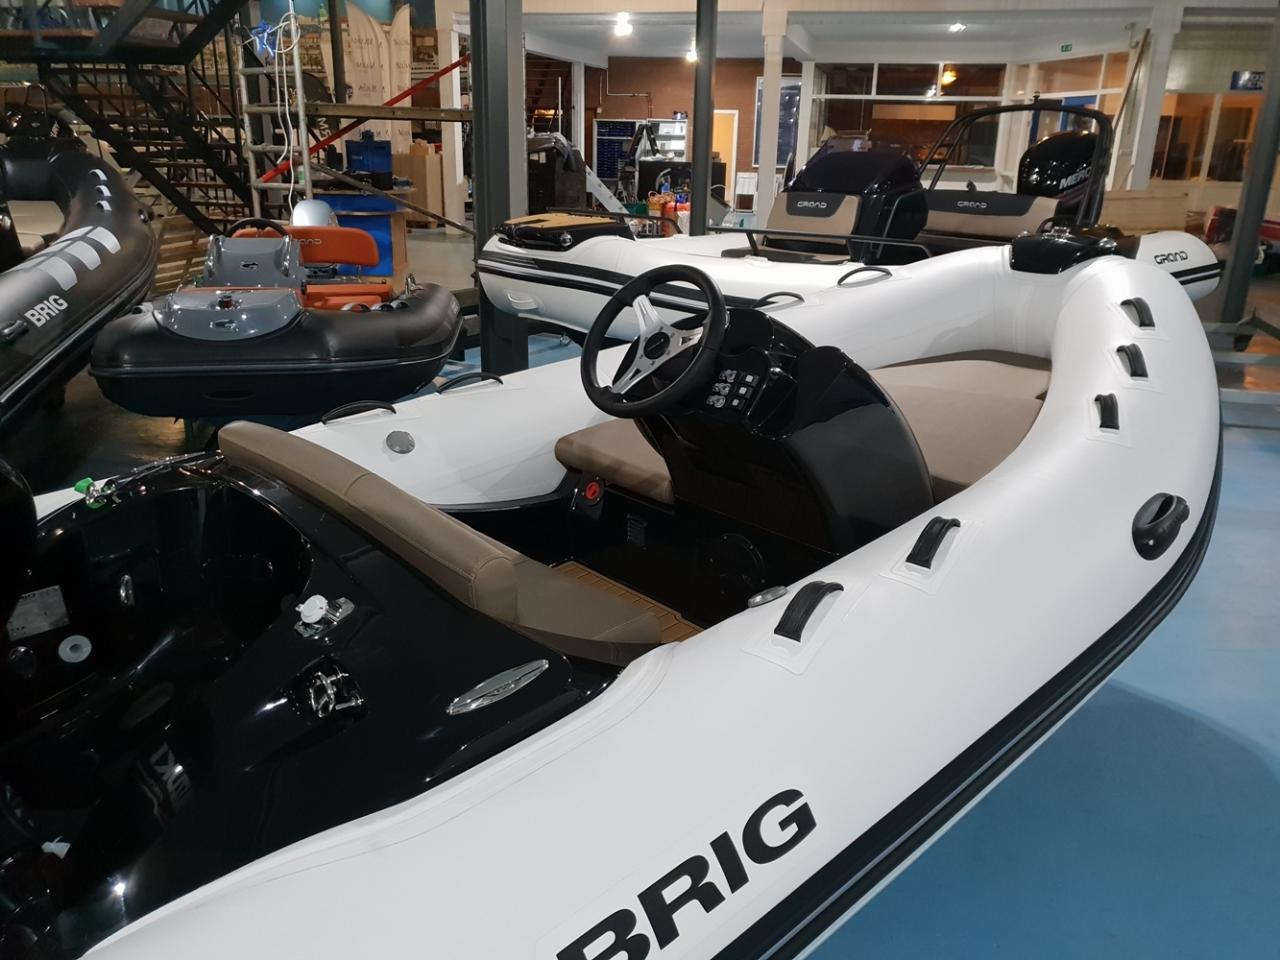 Brig Eagle 380 met Suzuki 50 pk motor 4